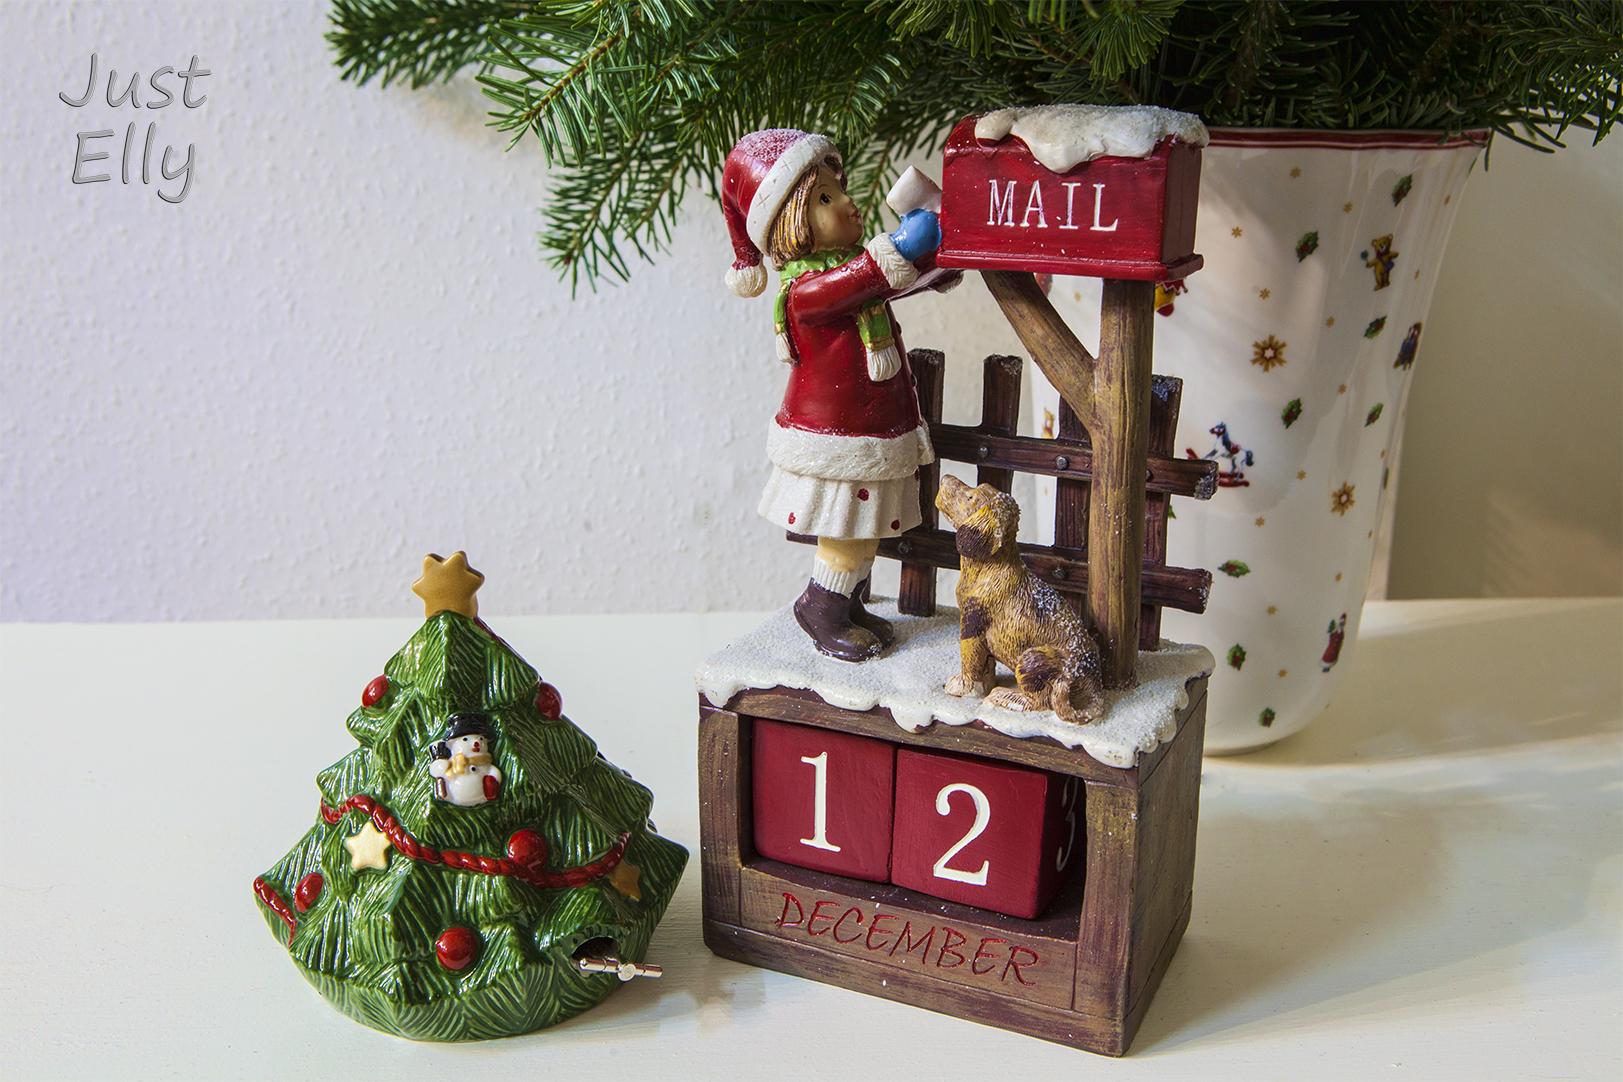 December 12 - My advent calendar